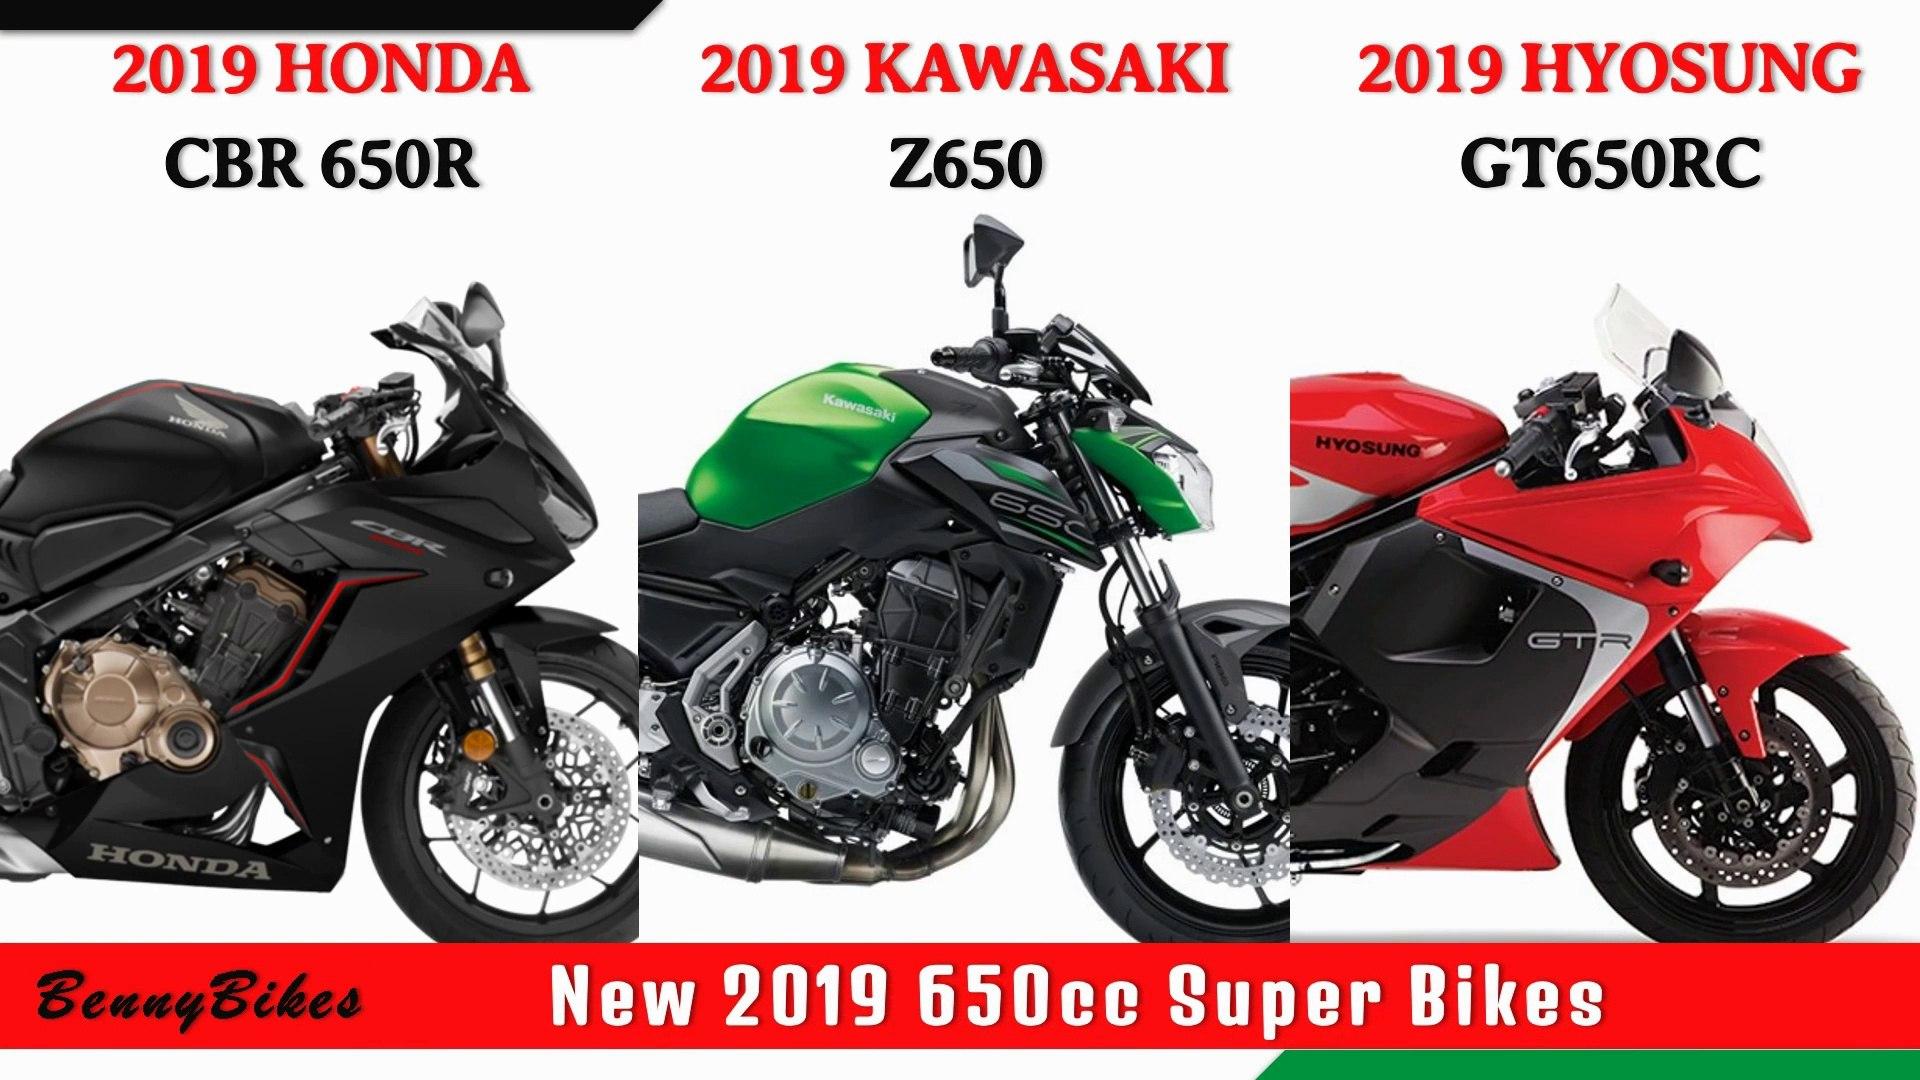 2019 All New Honda CBR 650R VS New 2019 Kawasaki Z650 VS New 2019 Hyosung  GT650RC